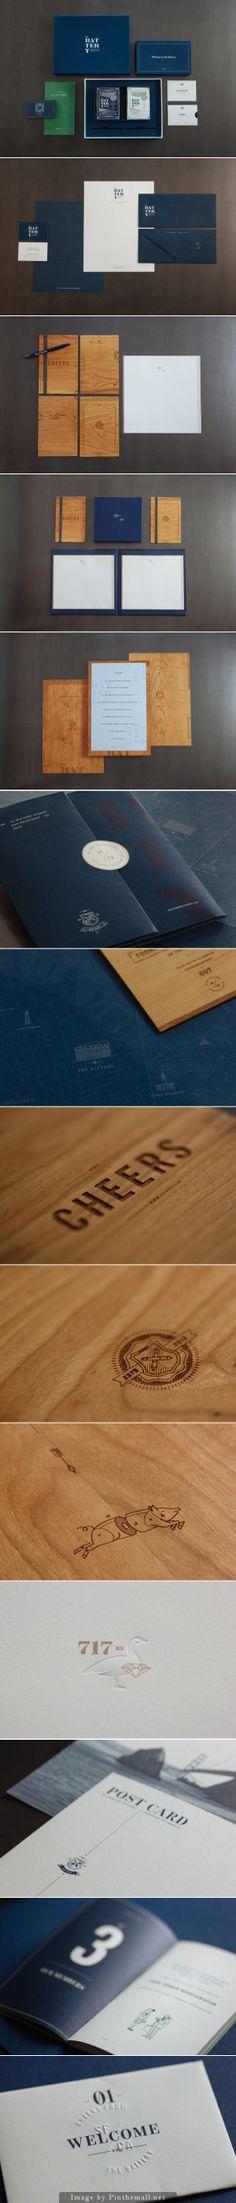 The Battery branding by MM http://www.mm-sf.com/